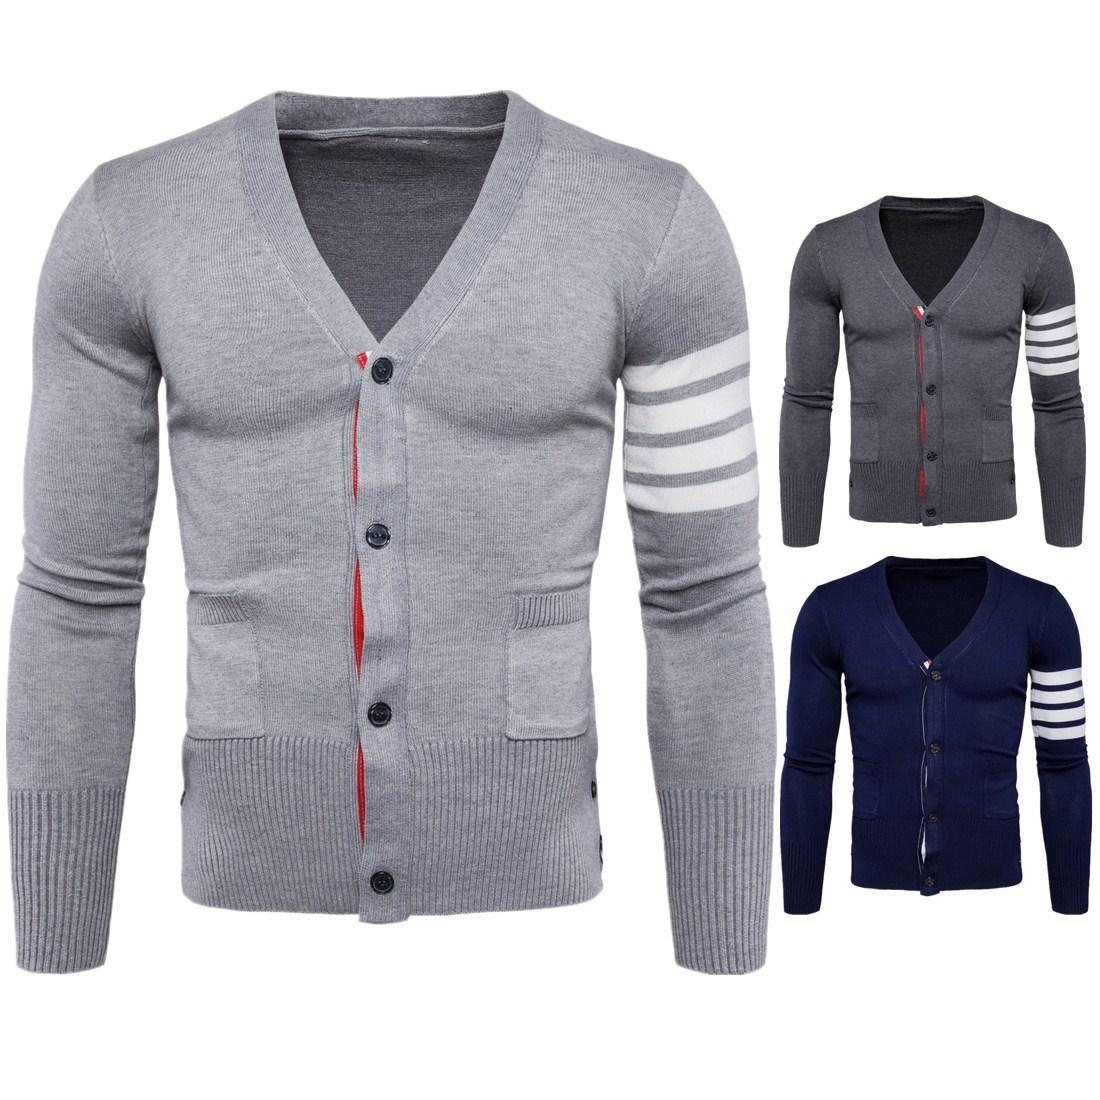 V Neck Men Knitwears Autumn Winter Warm Sweaters For Male Cardigan British Wild Men Knitwear With Pocket Coat M-2XL T170728